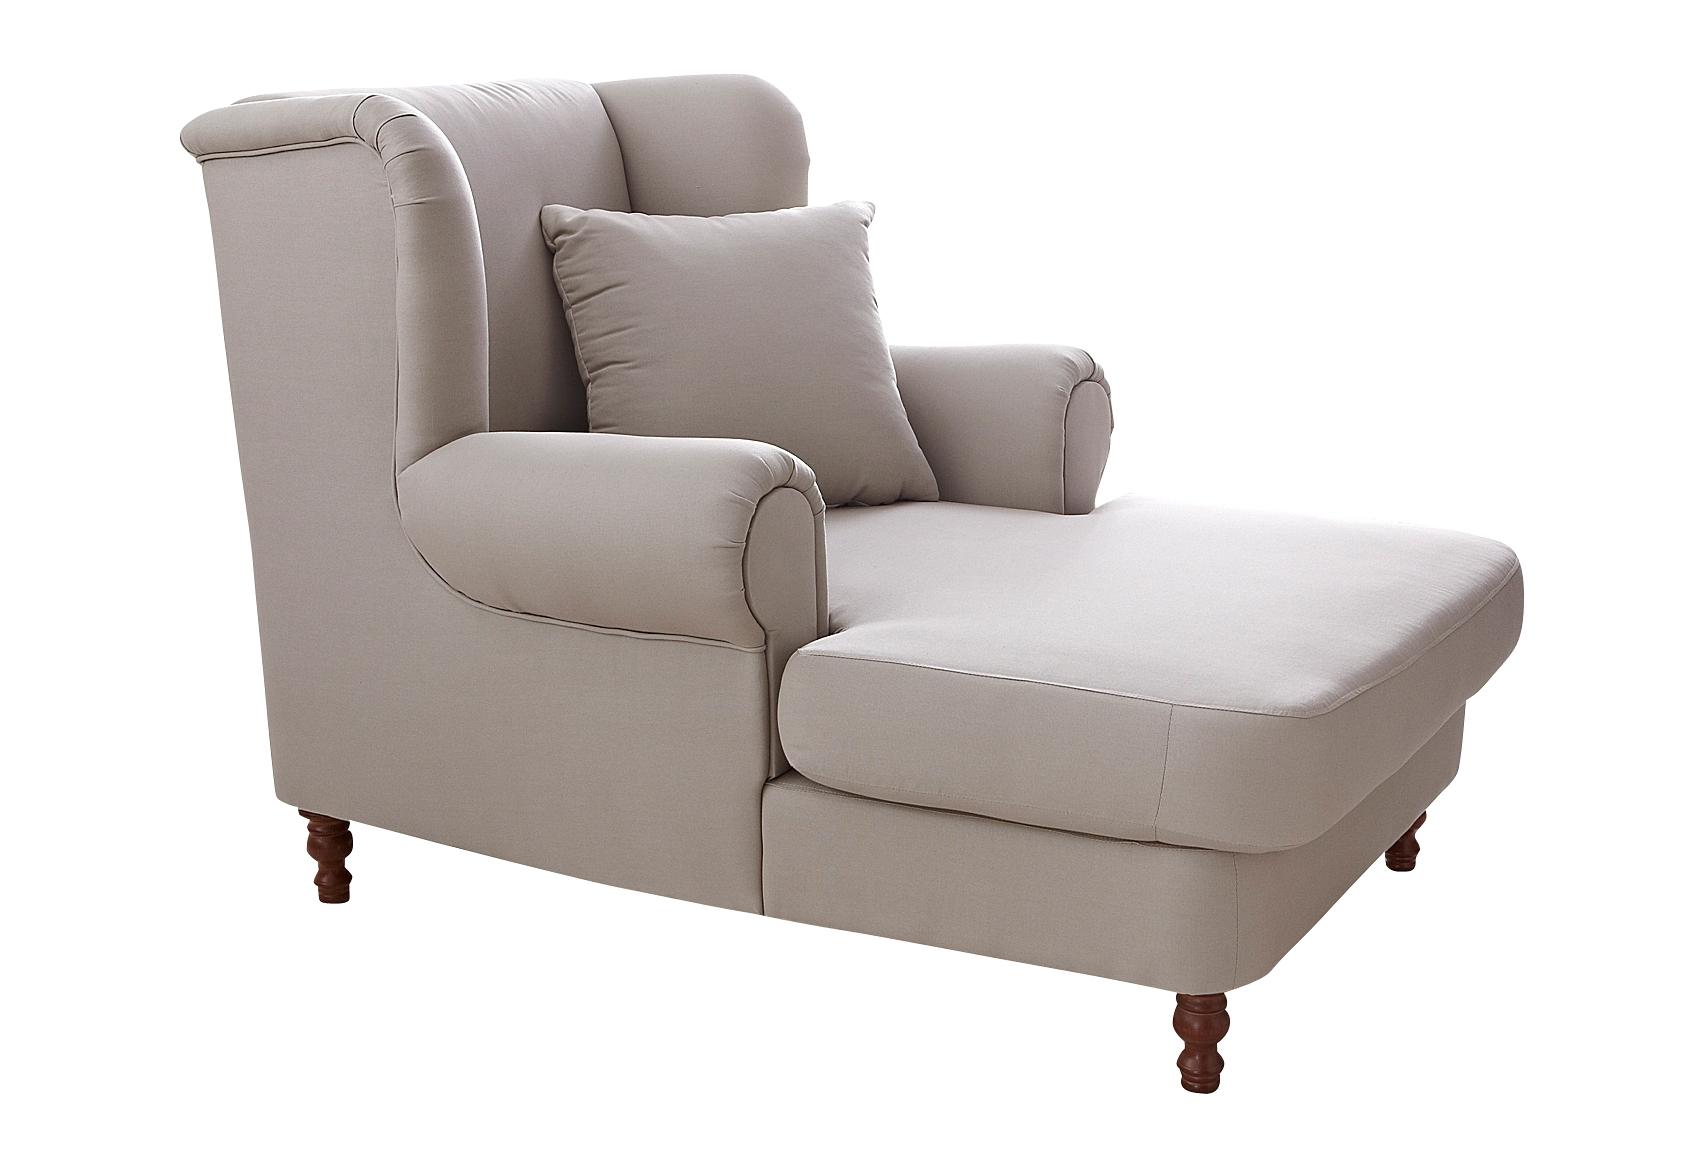 xxl fauteuils kopen groot aanbod xxl fauteuils otto. Black Bedroom Furniture Sets. Home Design Ideas